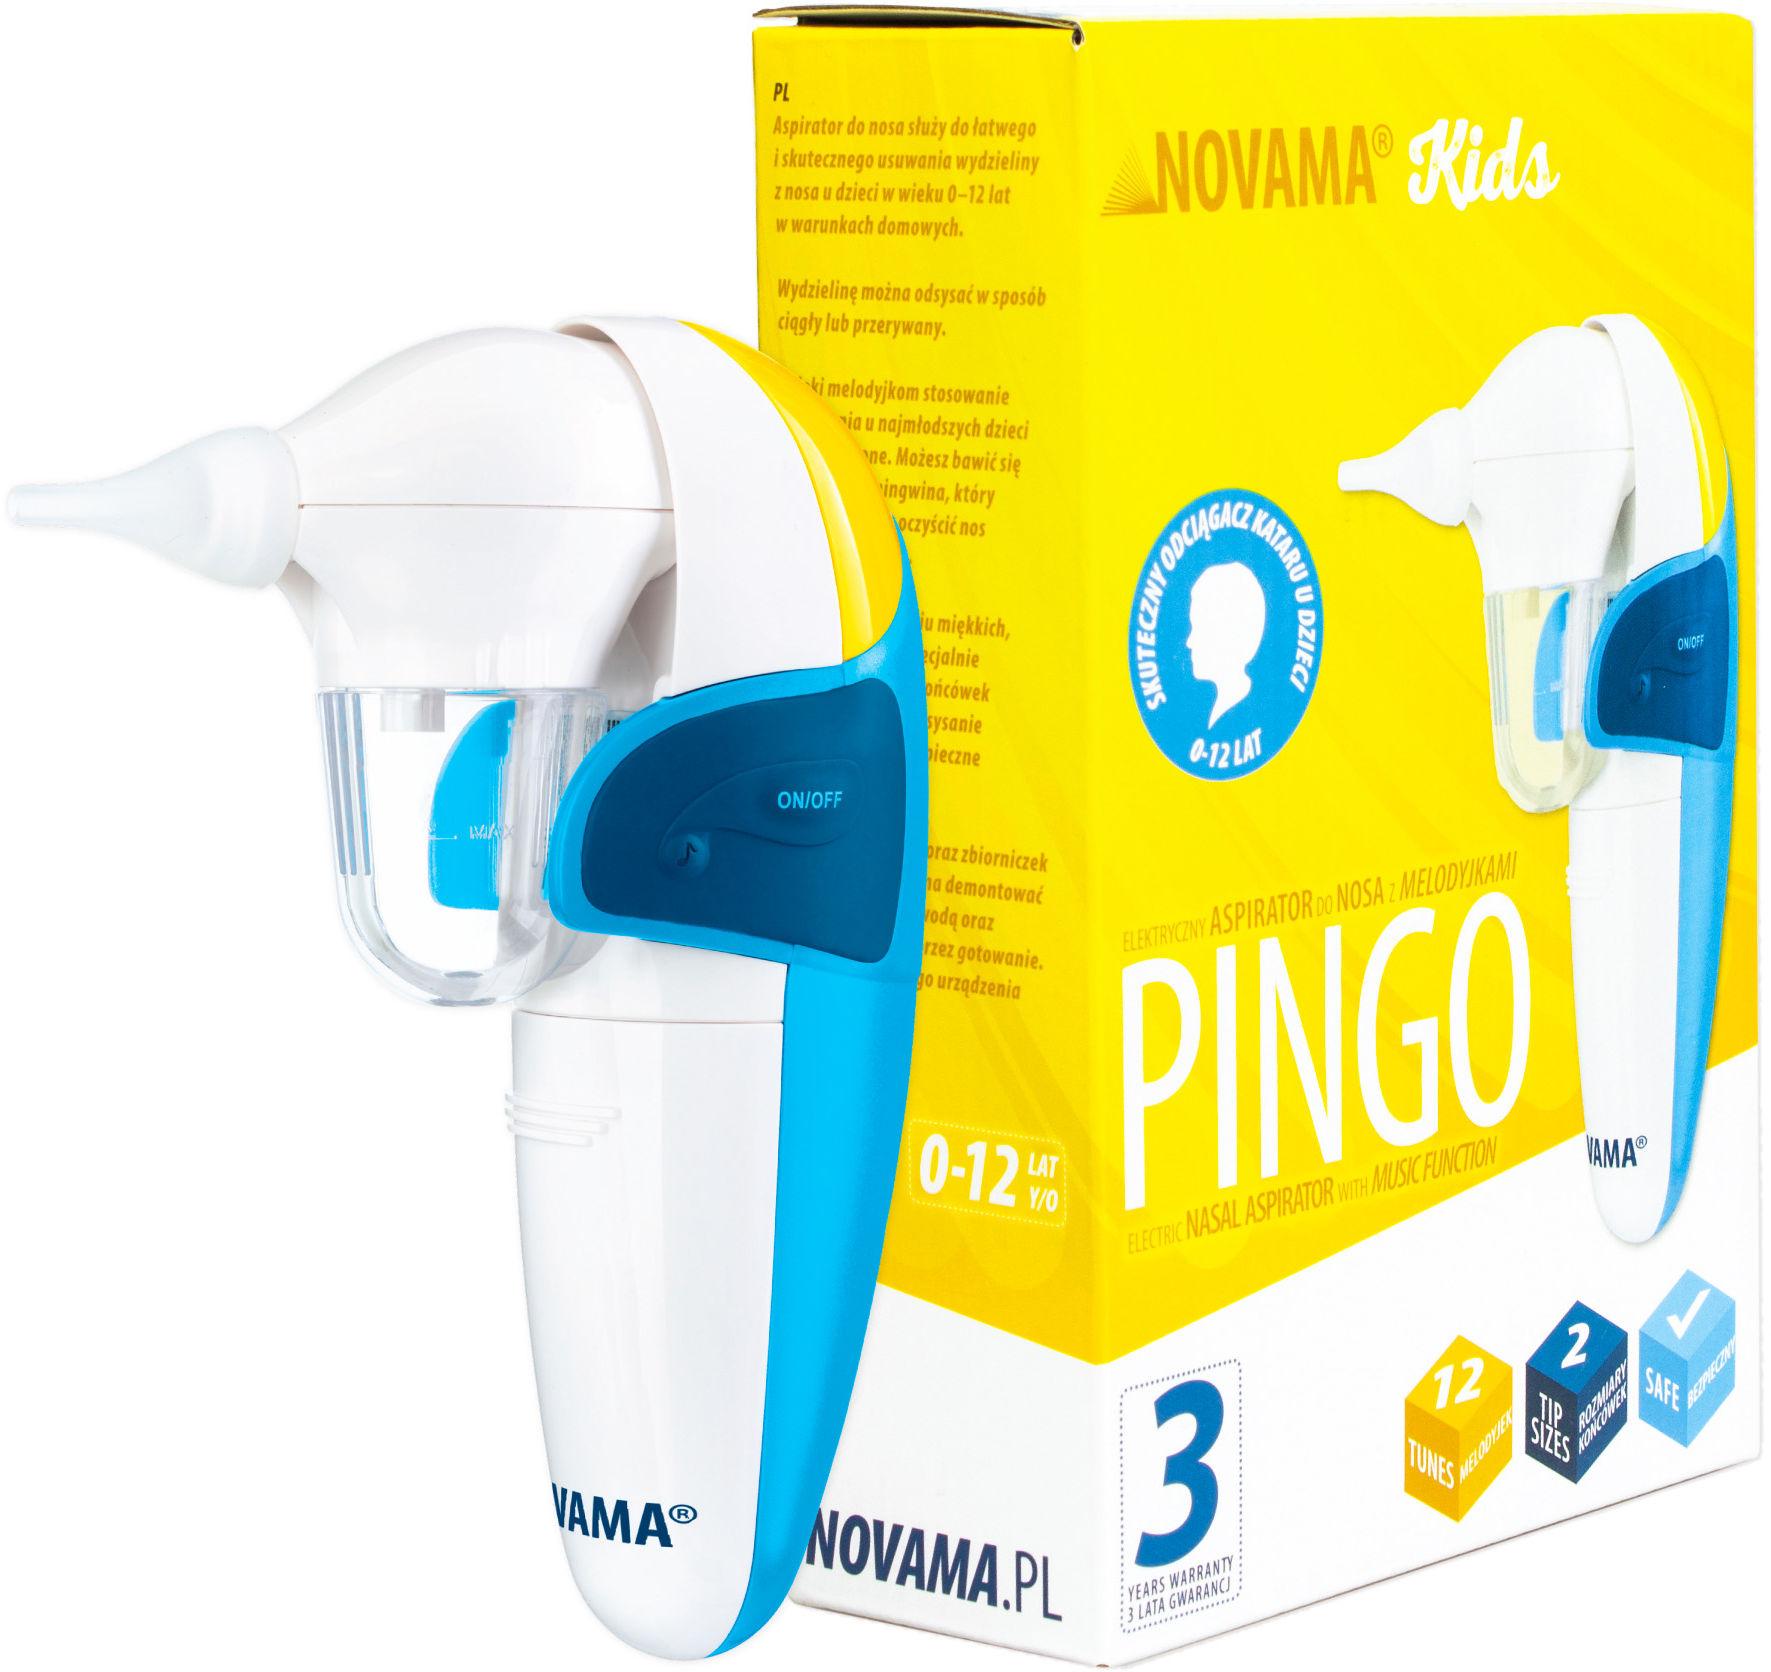 NOVAMA Pingo Aspirator do nosa (odciągacz kataru)